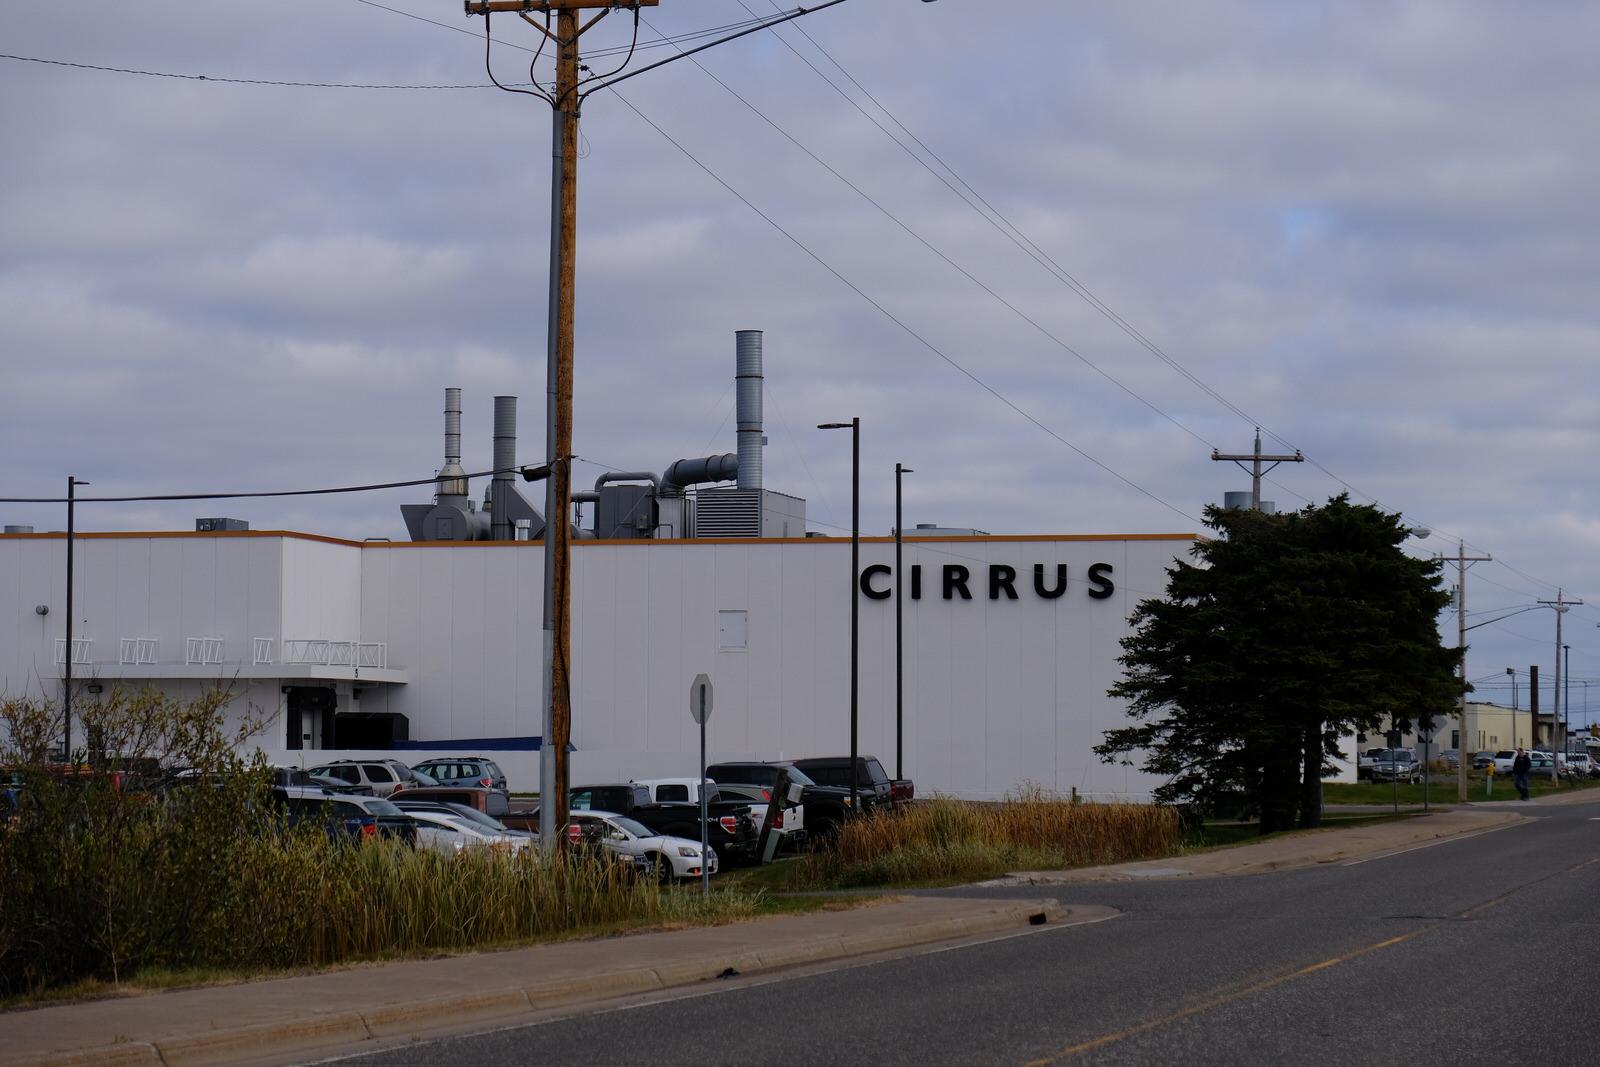 Cirrus' corporate headquarters in Duluth, Minnesota.